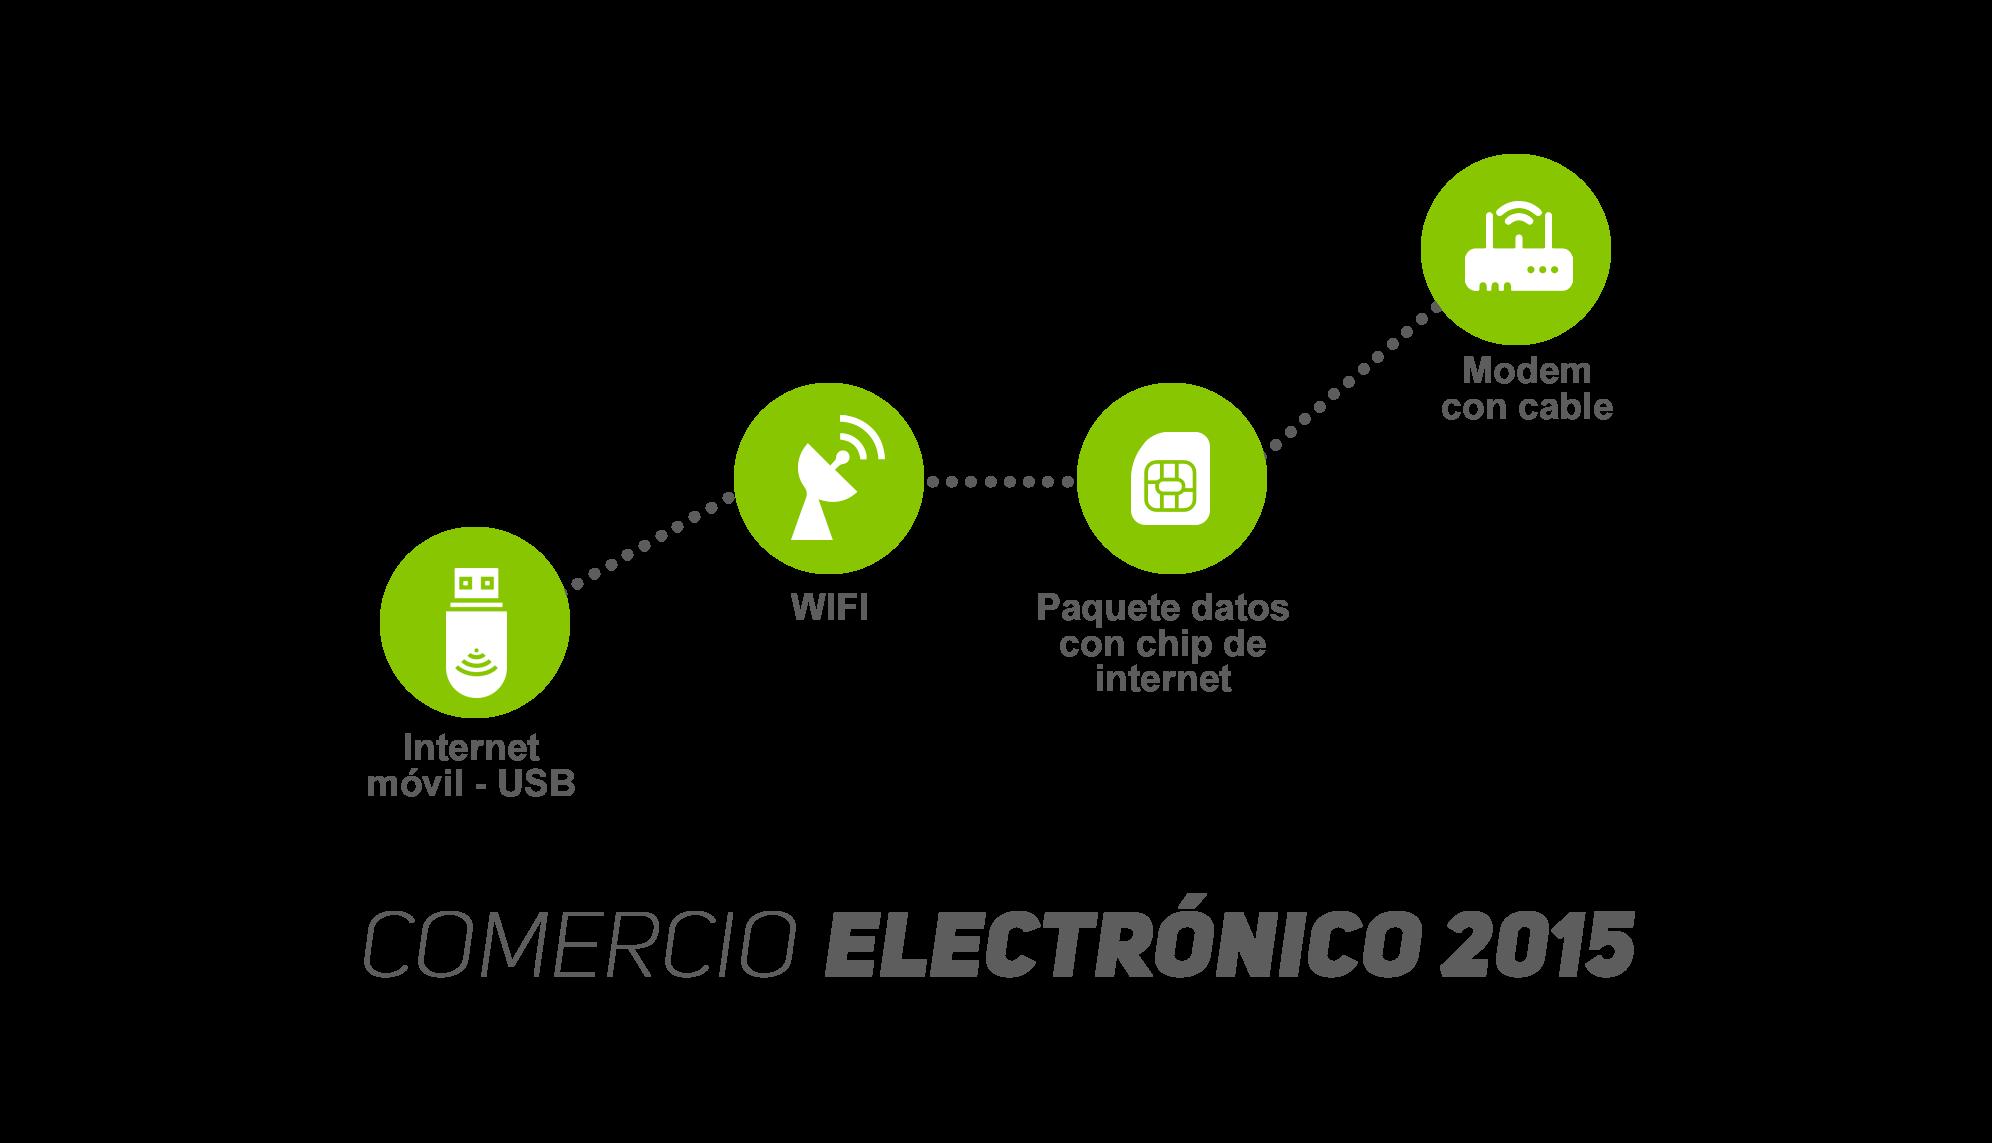 Comercio Electrónico 2015